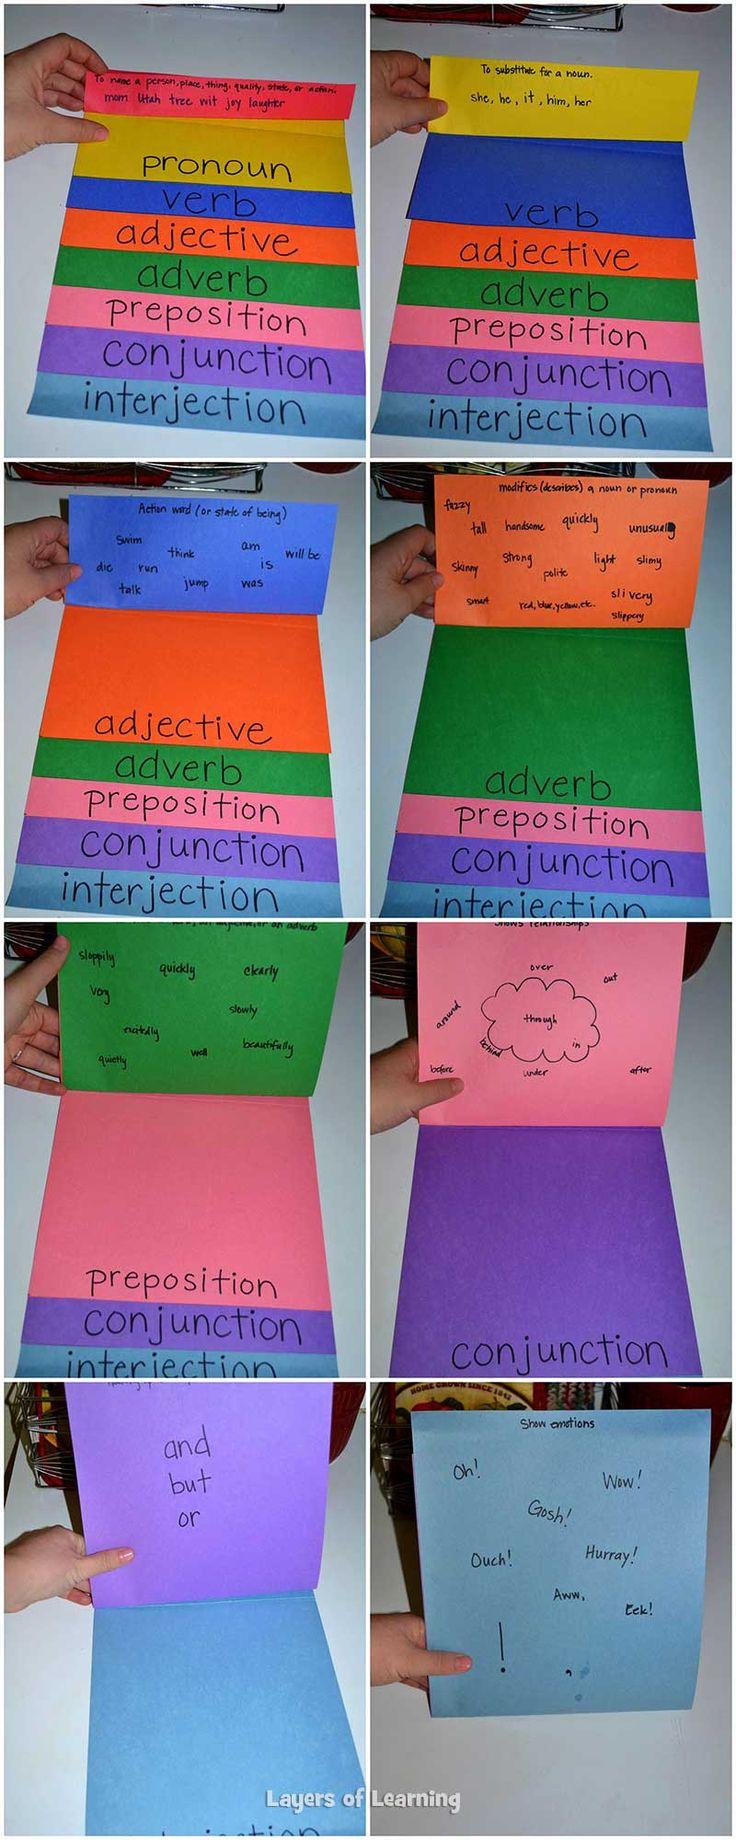 Parts-of-Speech-Flipbook